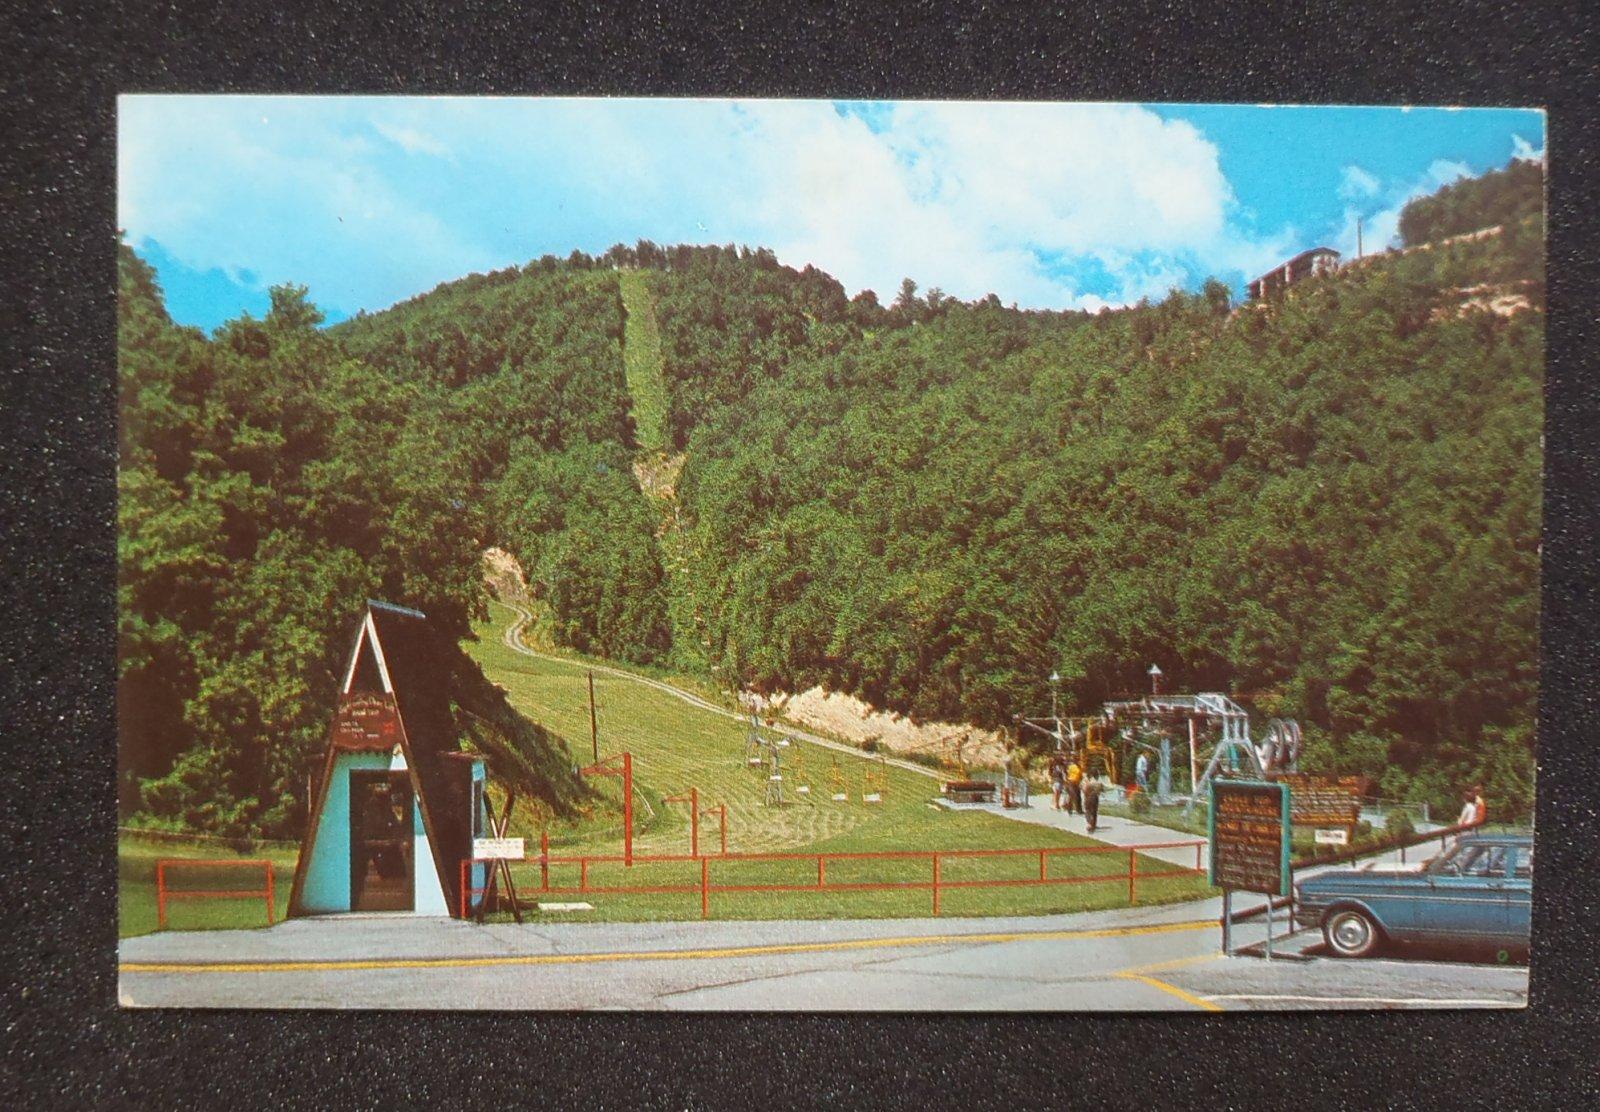 1960s Eagle Top Chair Lift Ski Resort Old Car Gatlinburg Tn Sevier Co Postcard Ebay